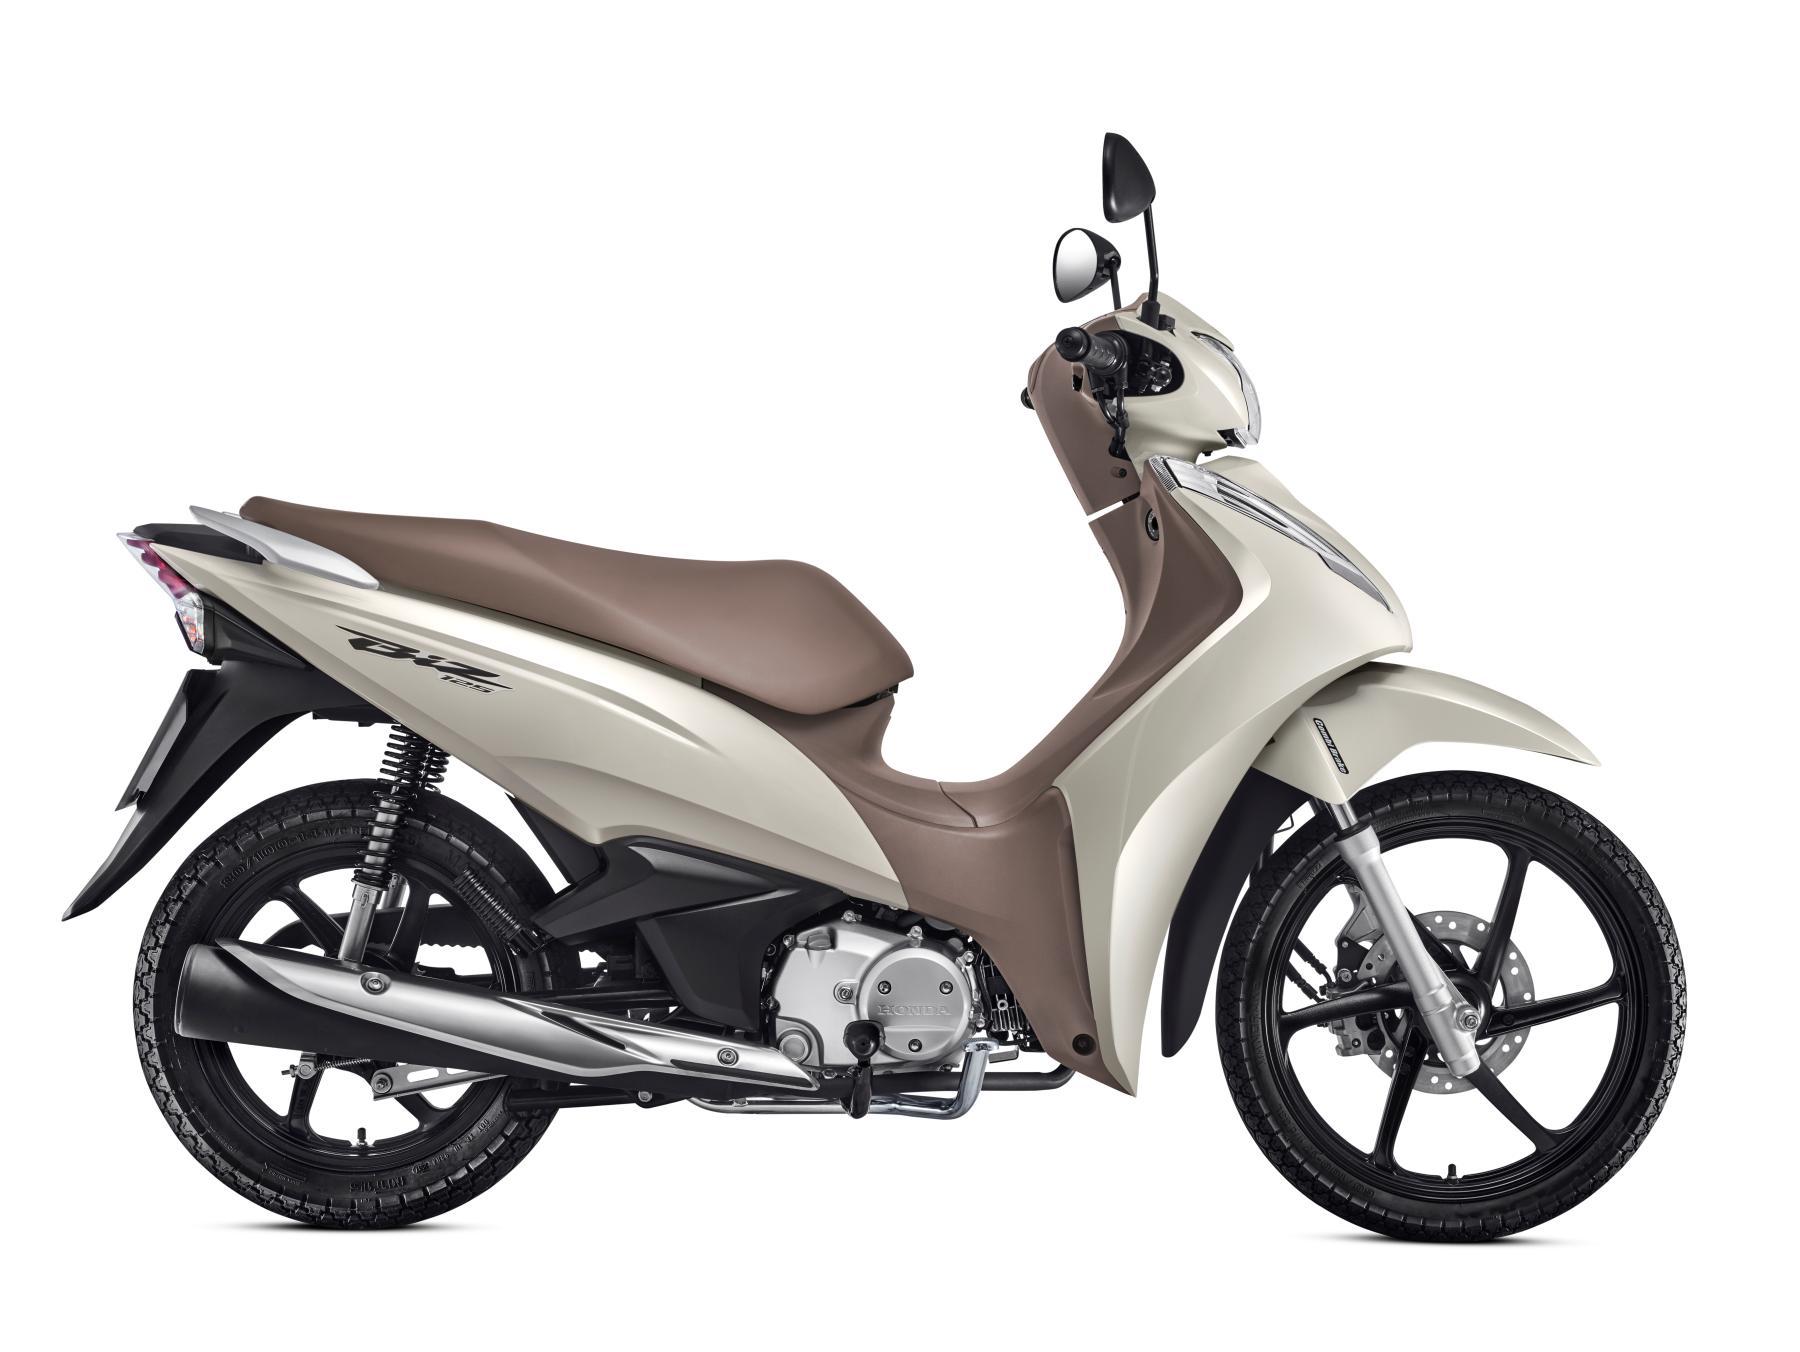 Ficha técnica da Honda Biz 125 2016 a 2019